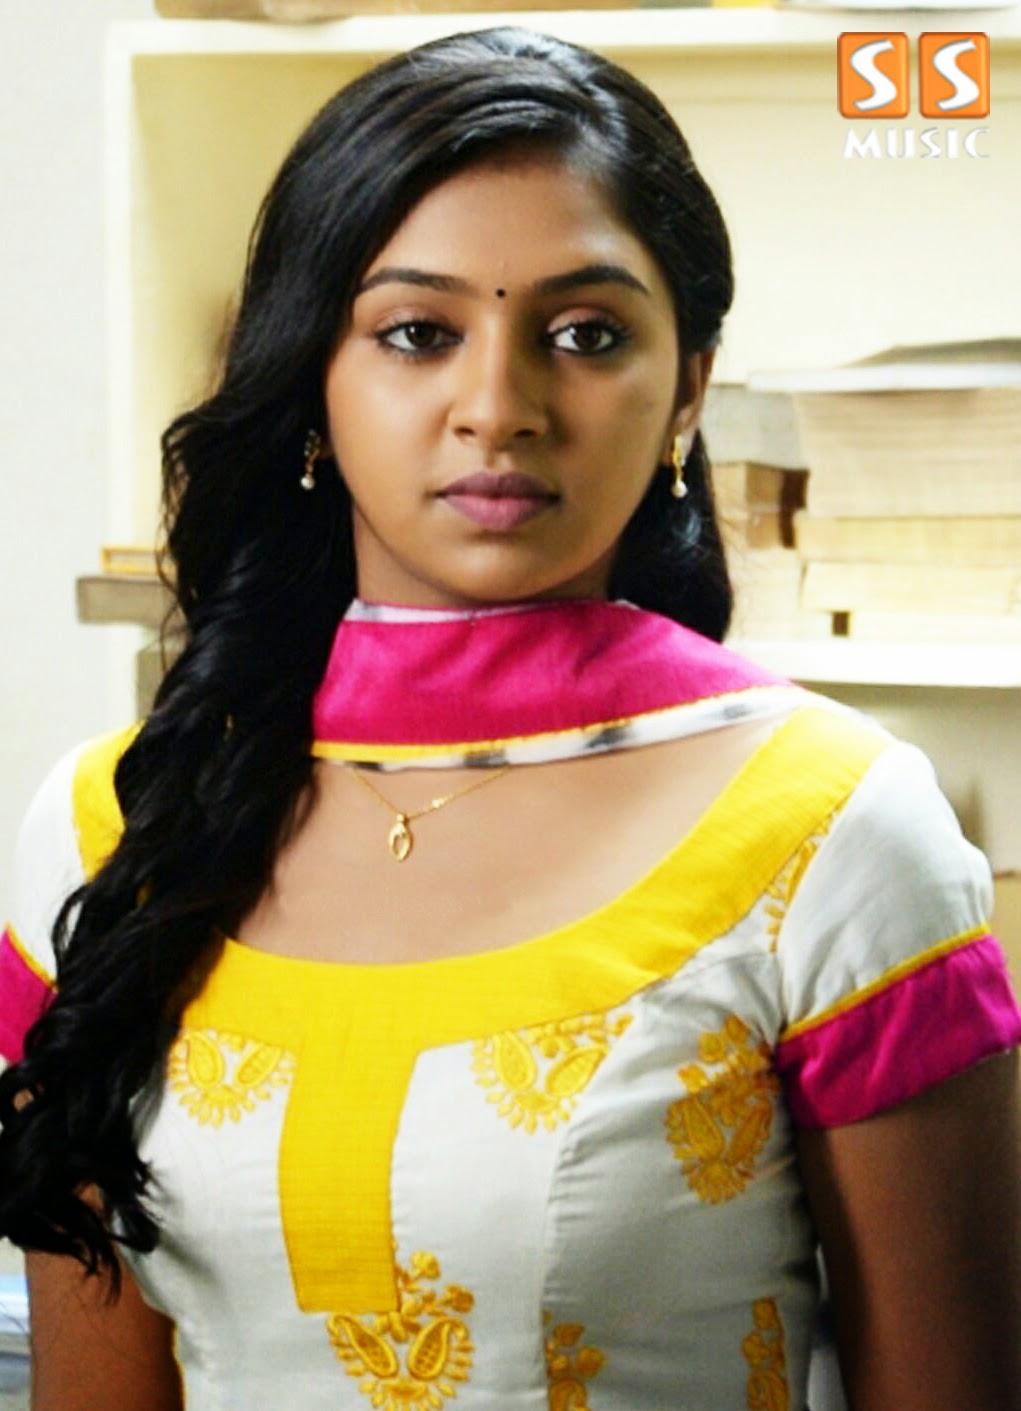 Lakshmi Menon's Extra Salary for Lip Lock Scenes ? ~ SS Music Naan Sigappu Manithan Lakshmi Menon Lip Lock